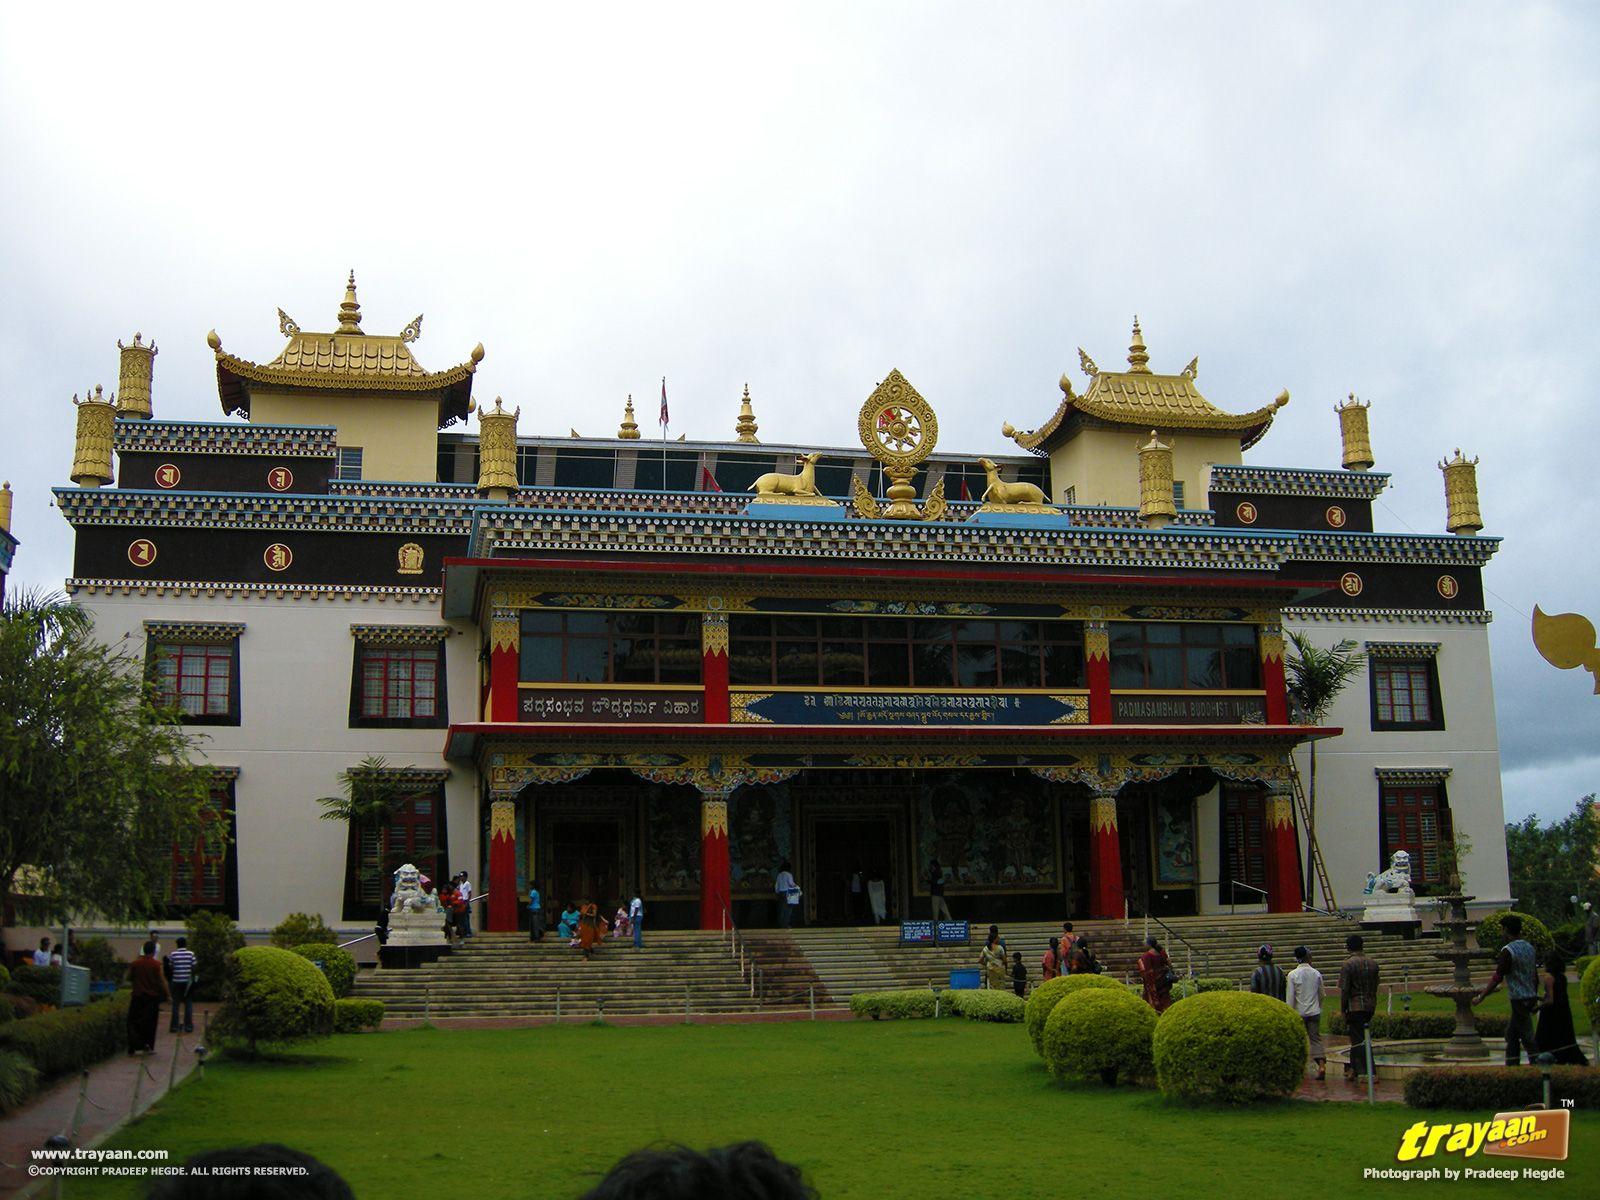 Padmasambhava Buddhist Vihara - popularly known as Golden temple in Namdroling Monastery, Bylakuppe, Mysore district, Karnataka